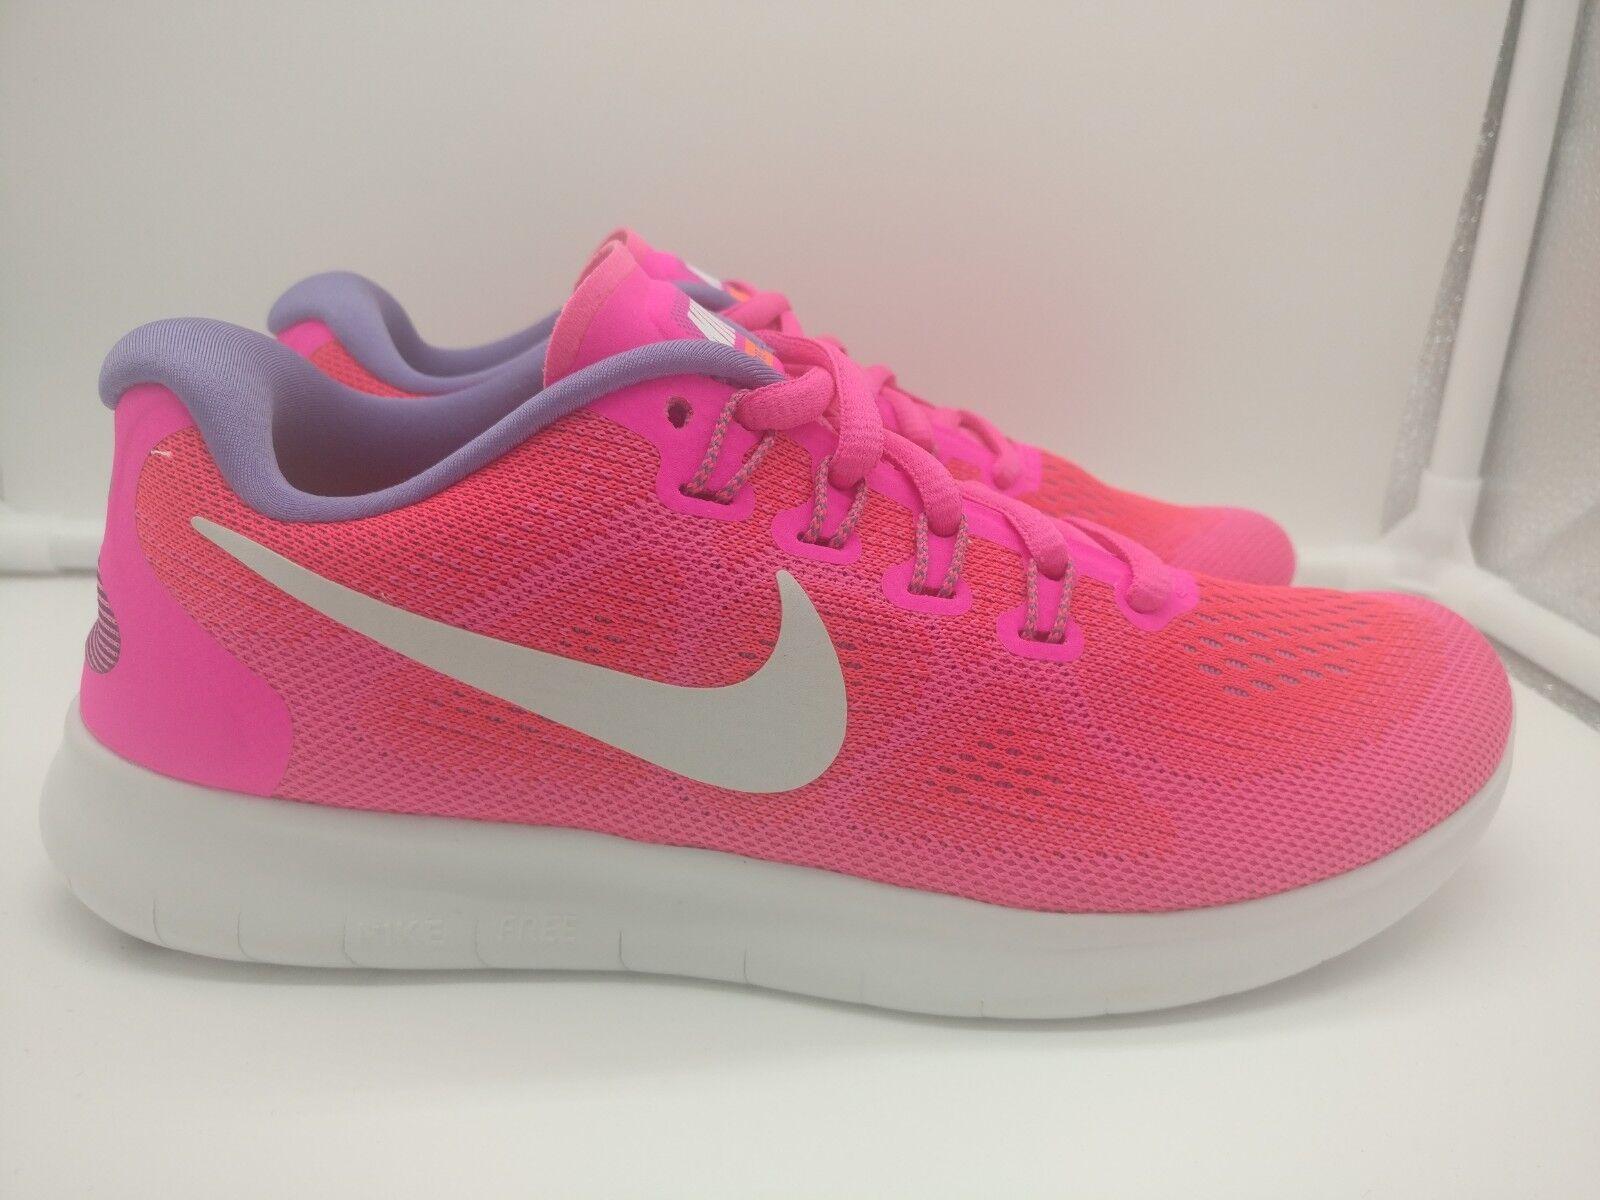 Nike de mujer libre rn 2017 ejecutar UK 3 3 3 Racer rosado blancoo Apagado 880840-601  popular